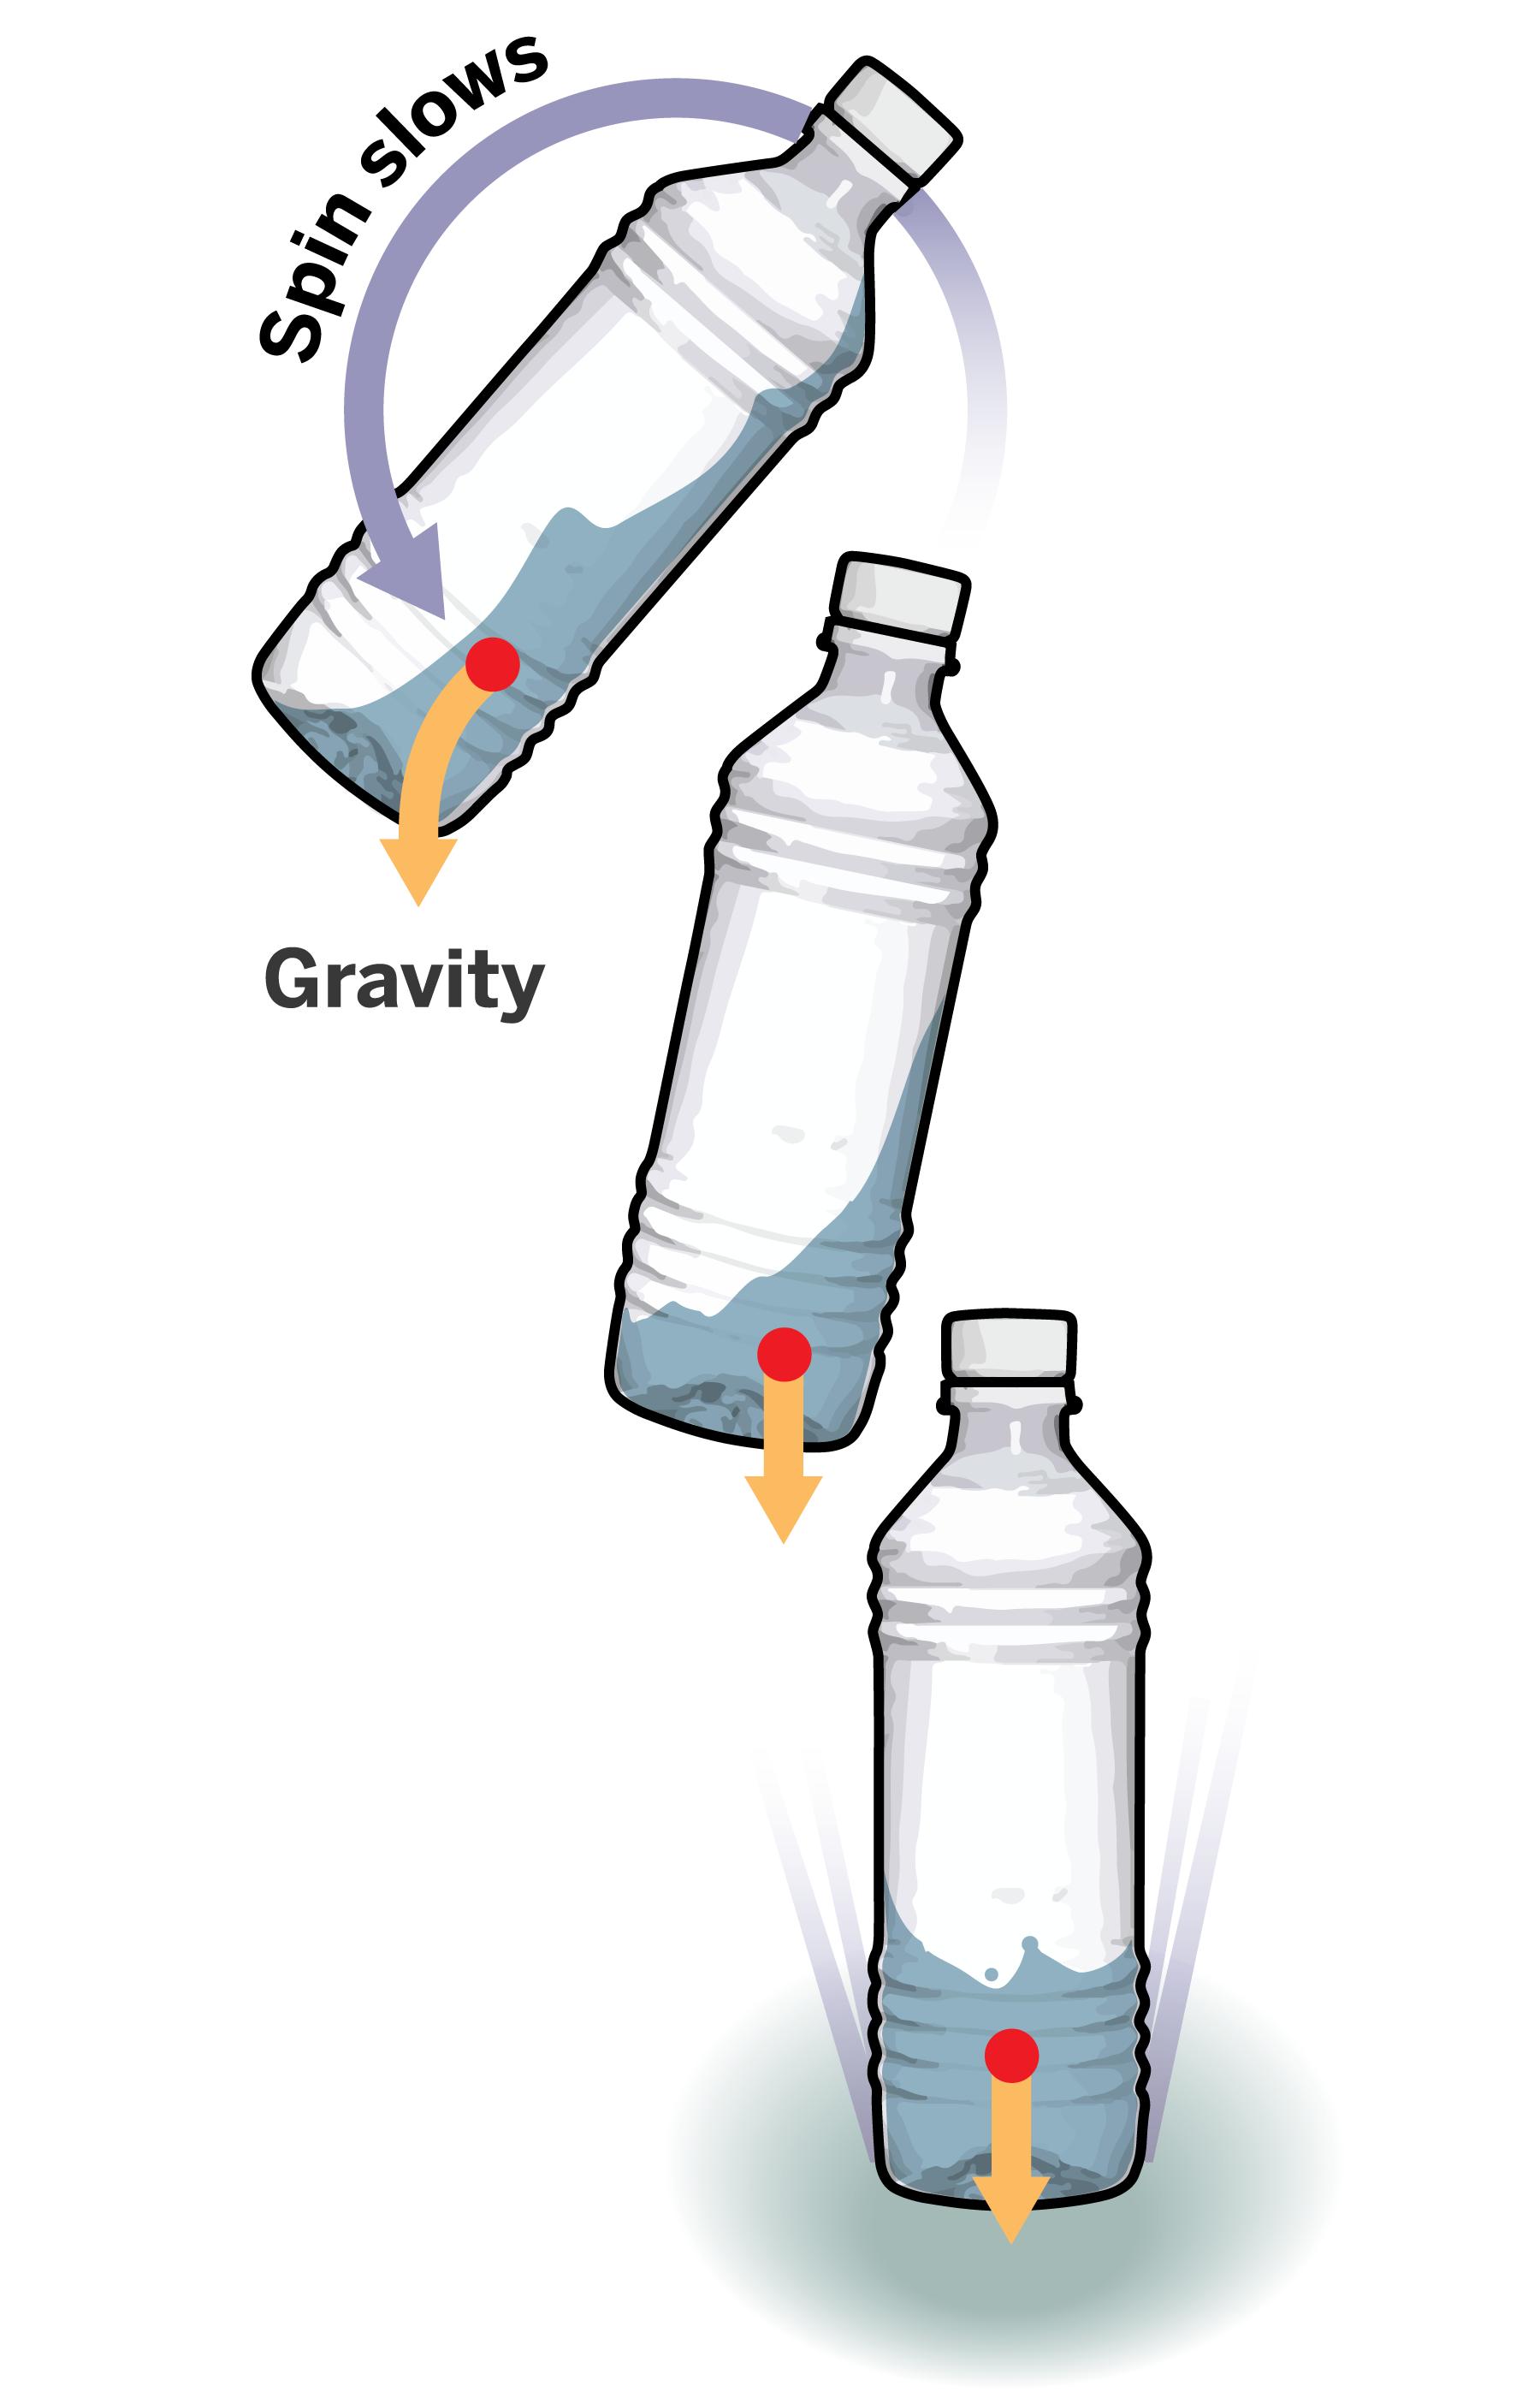 6874624e38 Water Bottle Flipping - by Corey Peschel [Infographic]